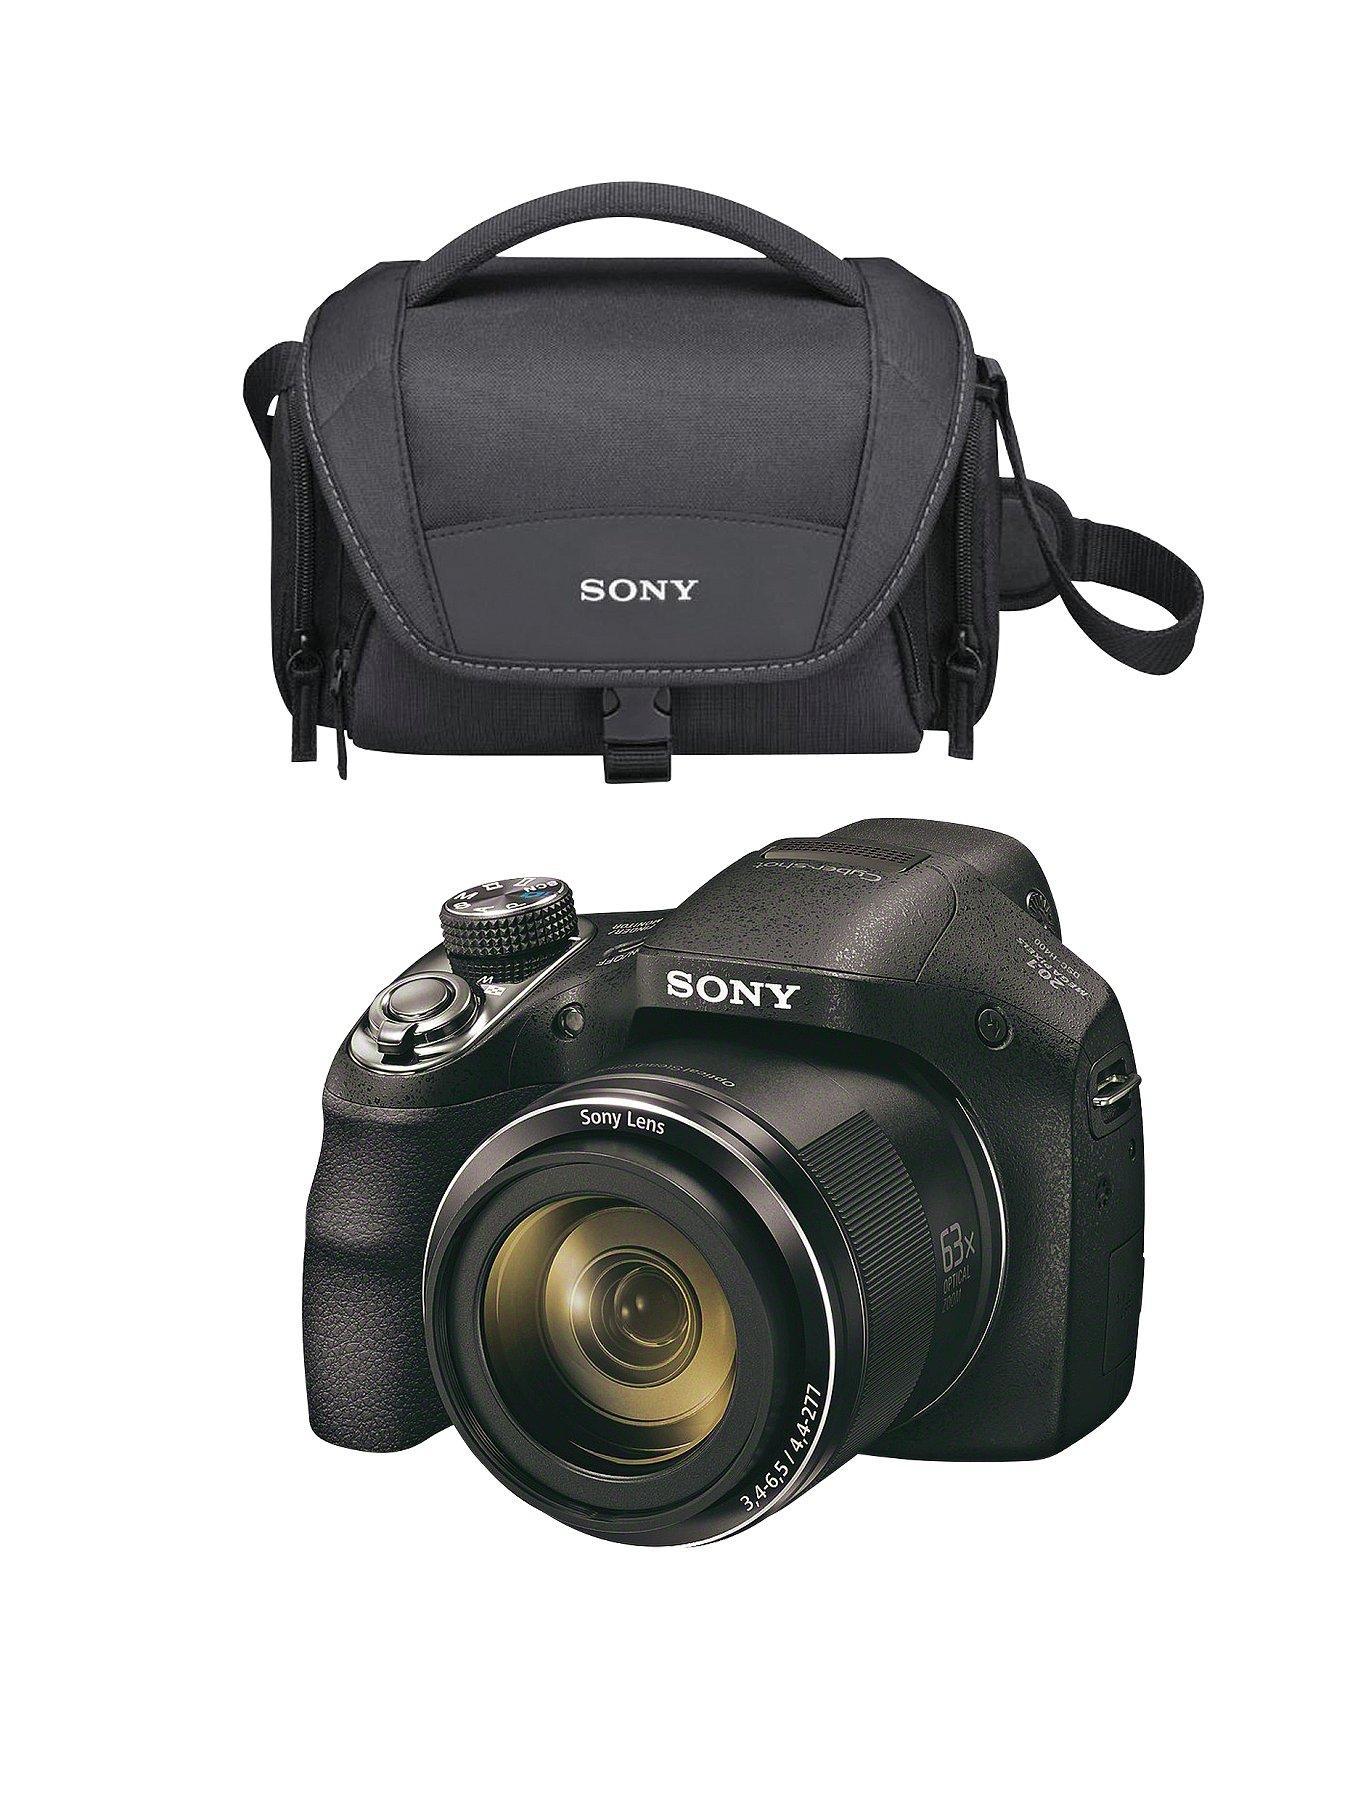 Sony DSCH400 Digital Camera